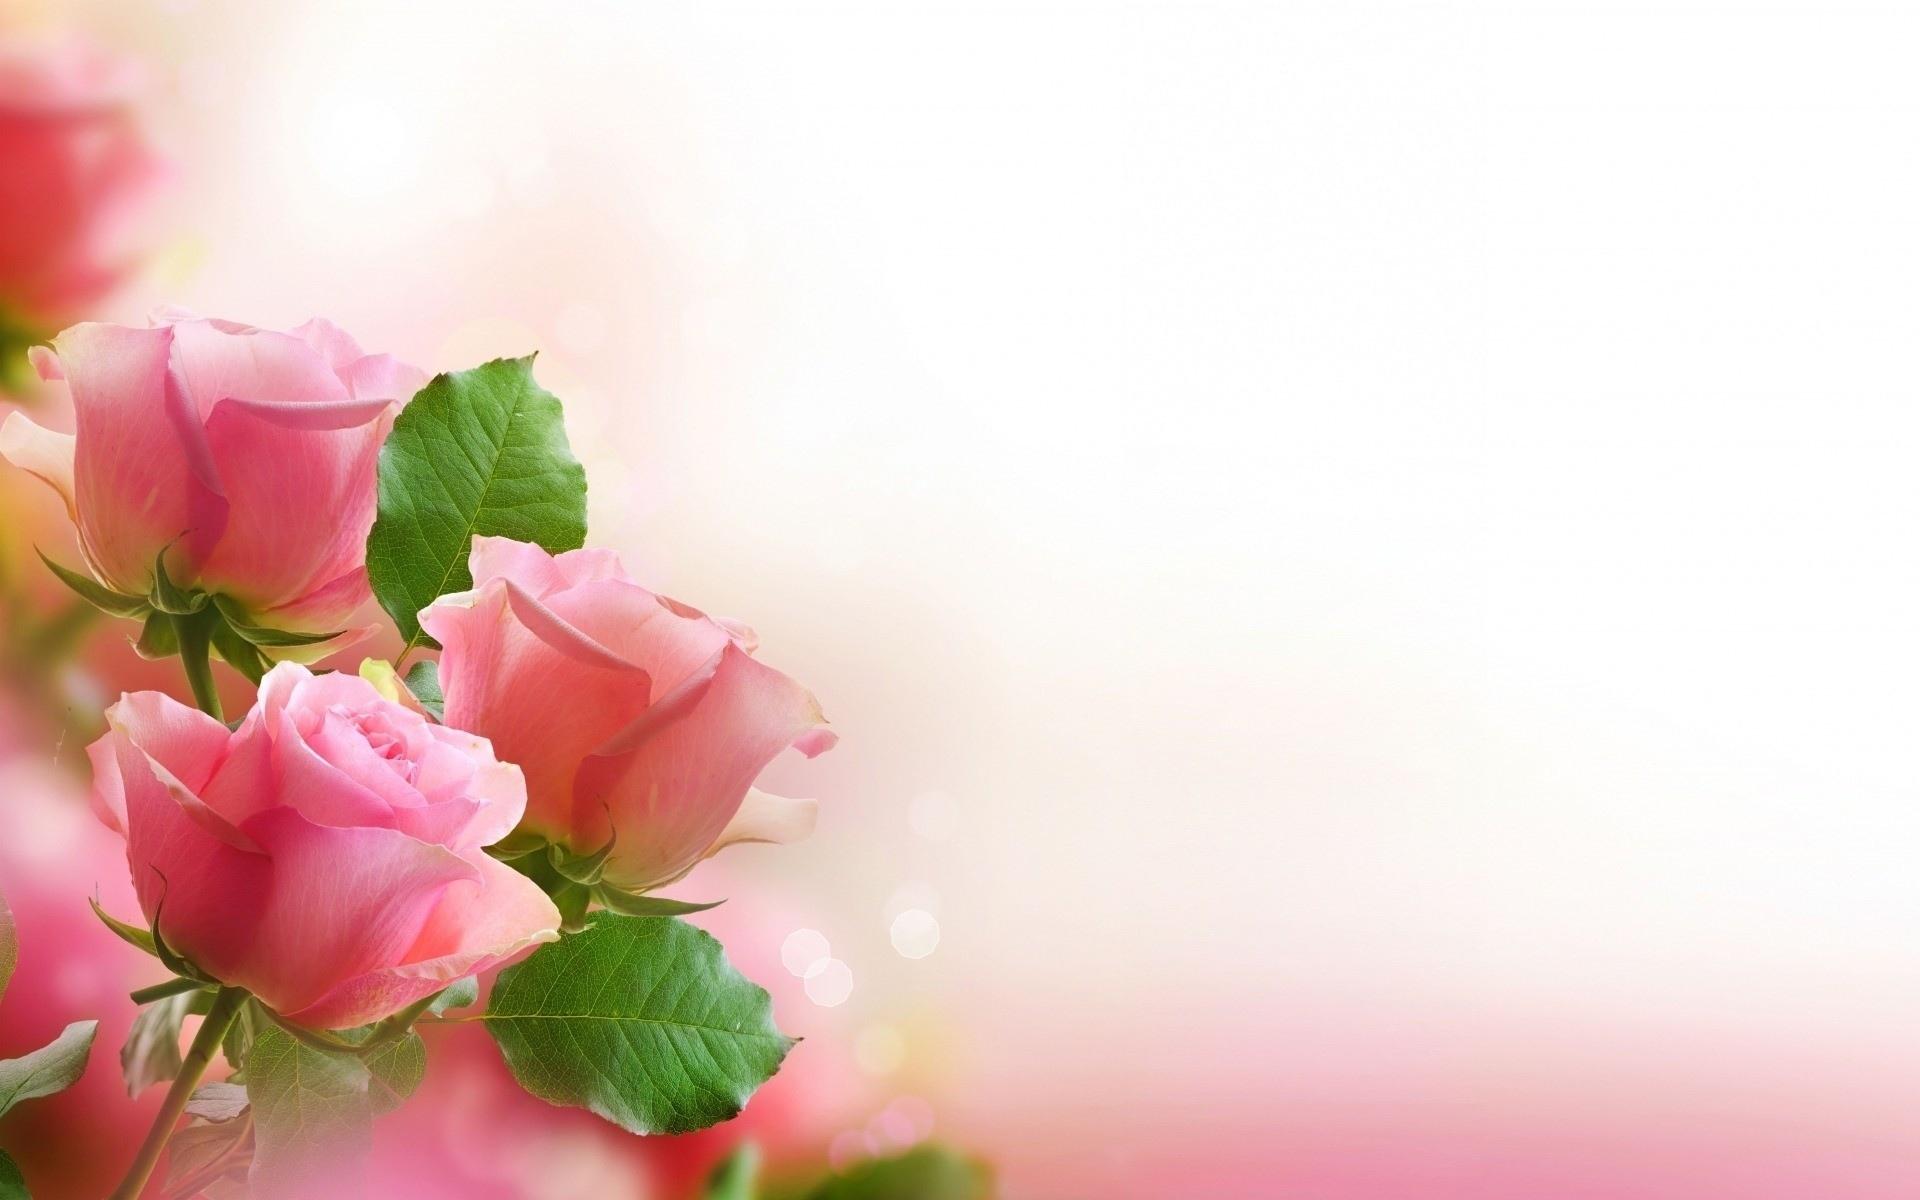 Amazing Wallpaper Love Flower - romantic-love-flowers-pictures-4-cool-hd-wallpaper  Gallery_808980.jpg